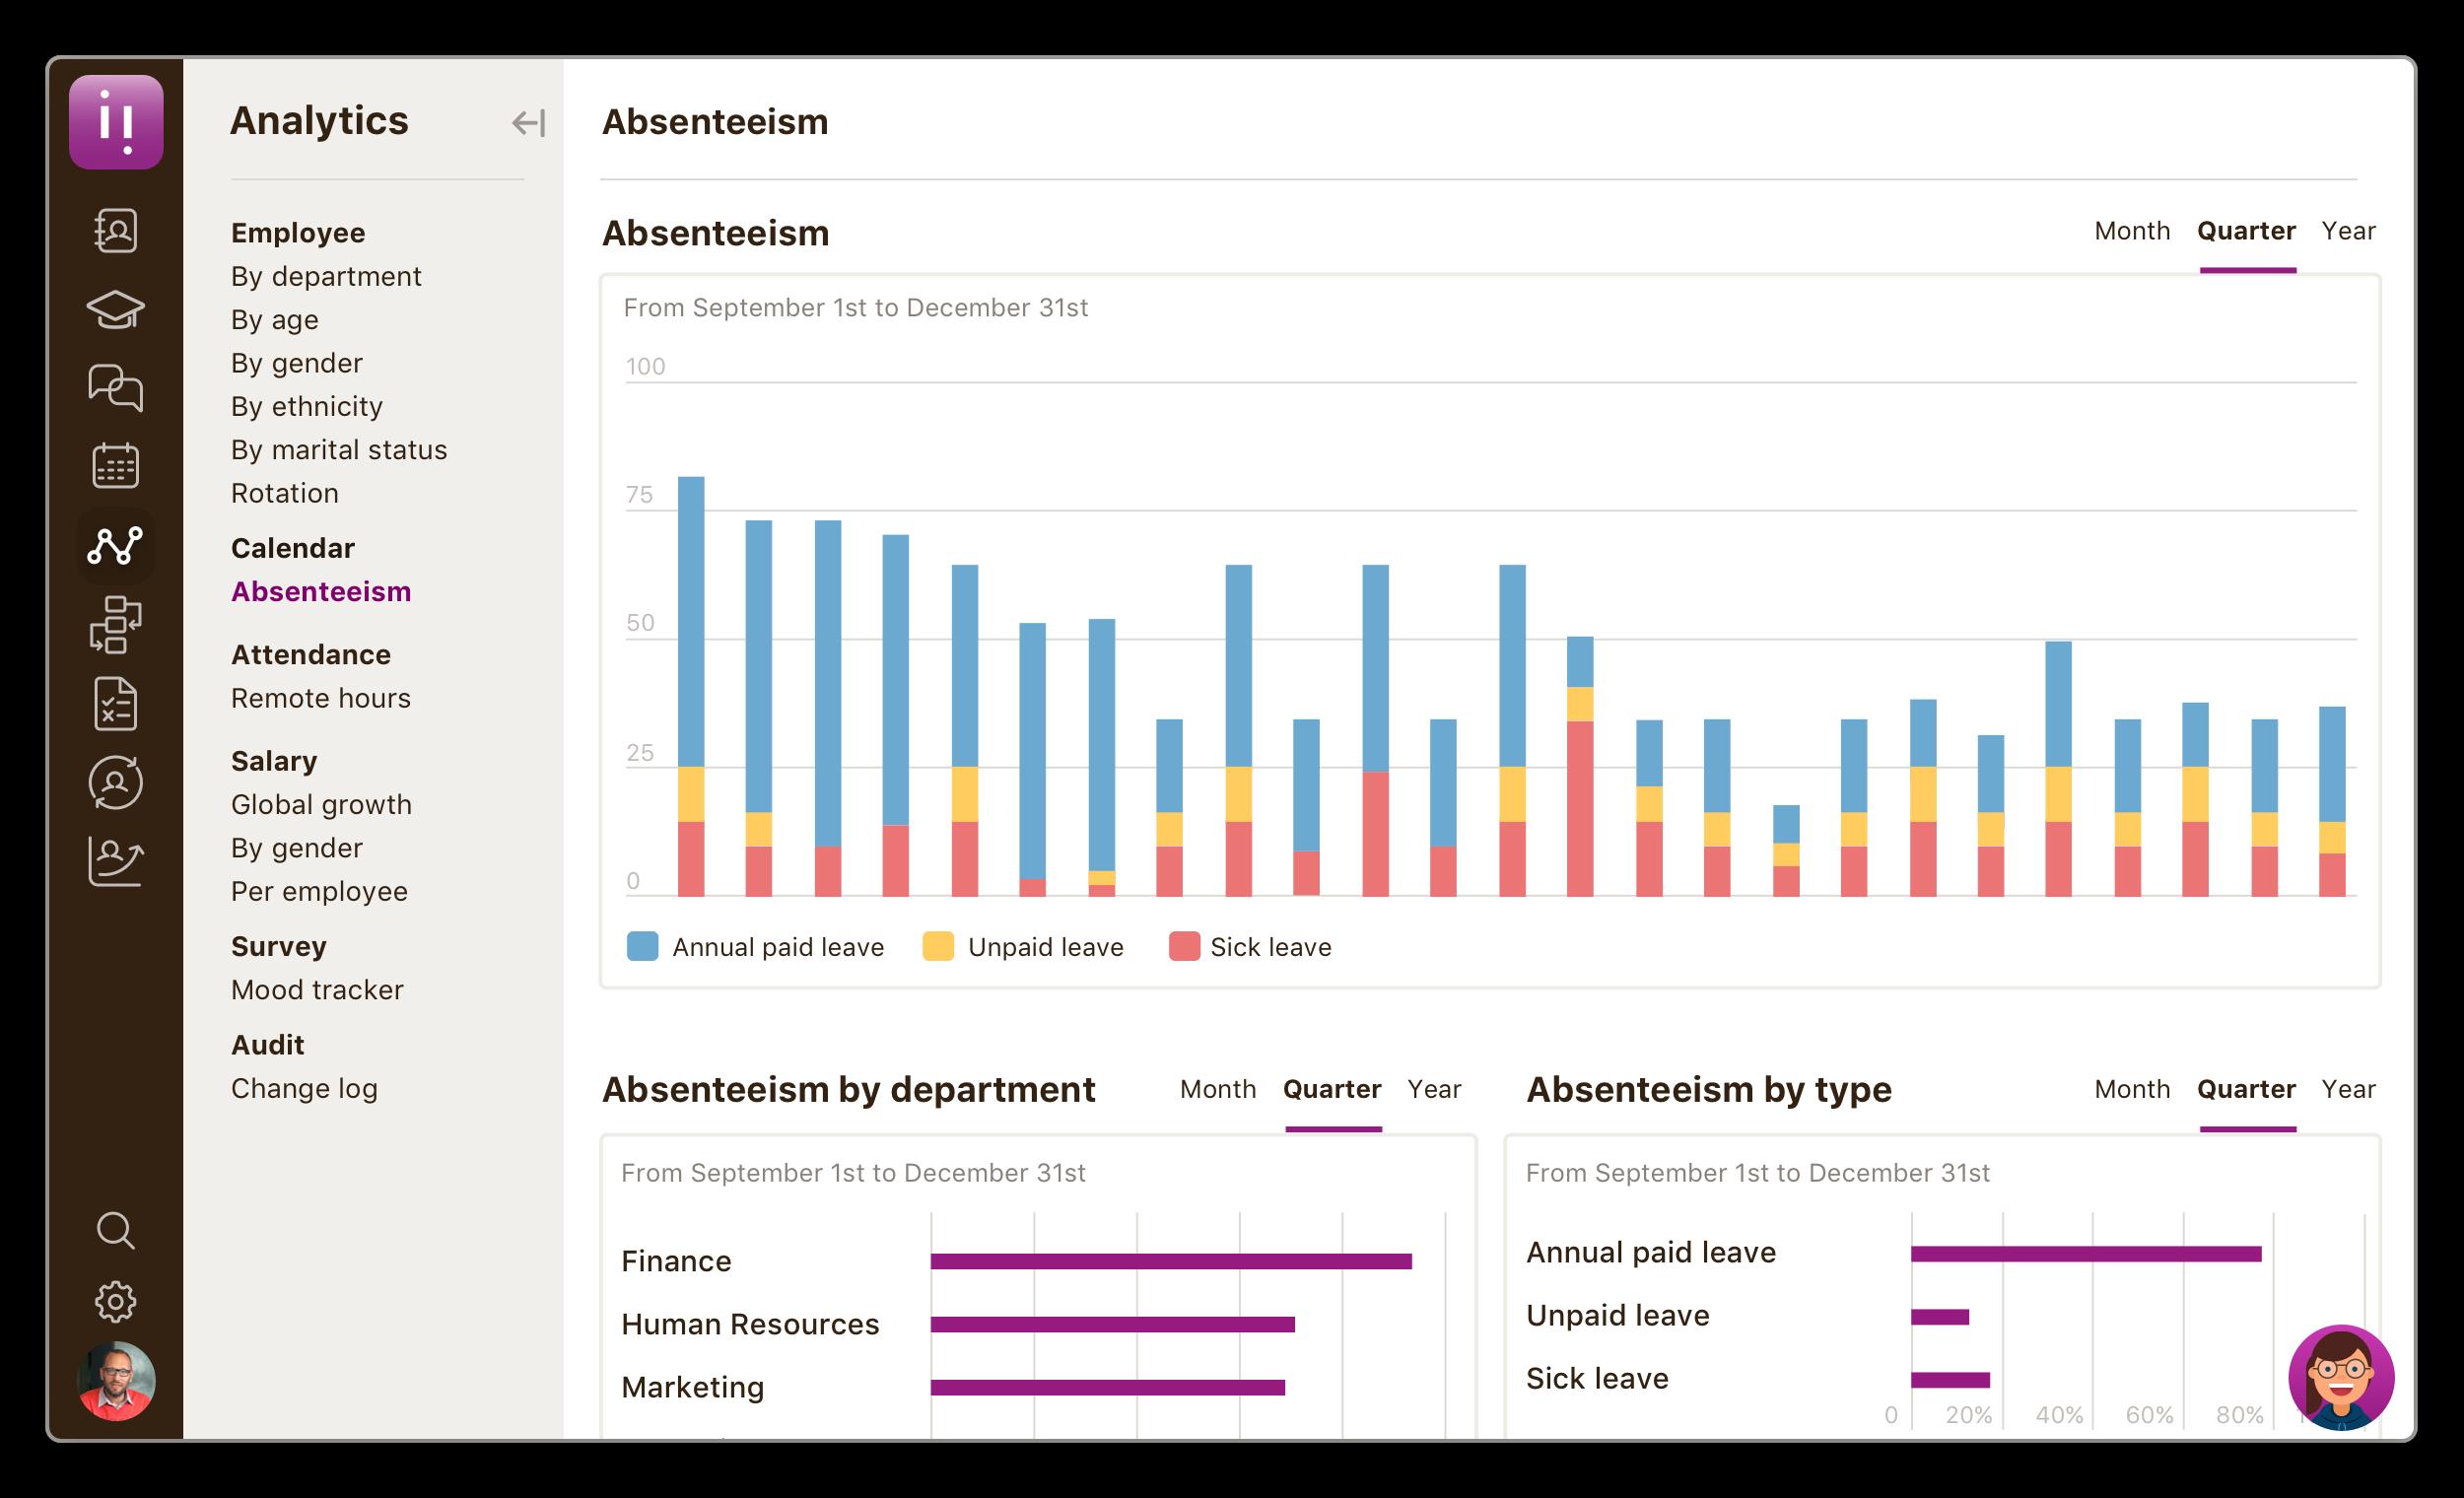 Niikiis Software - Analytics Absteneeism